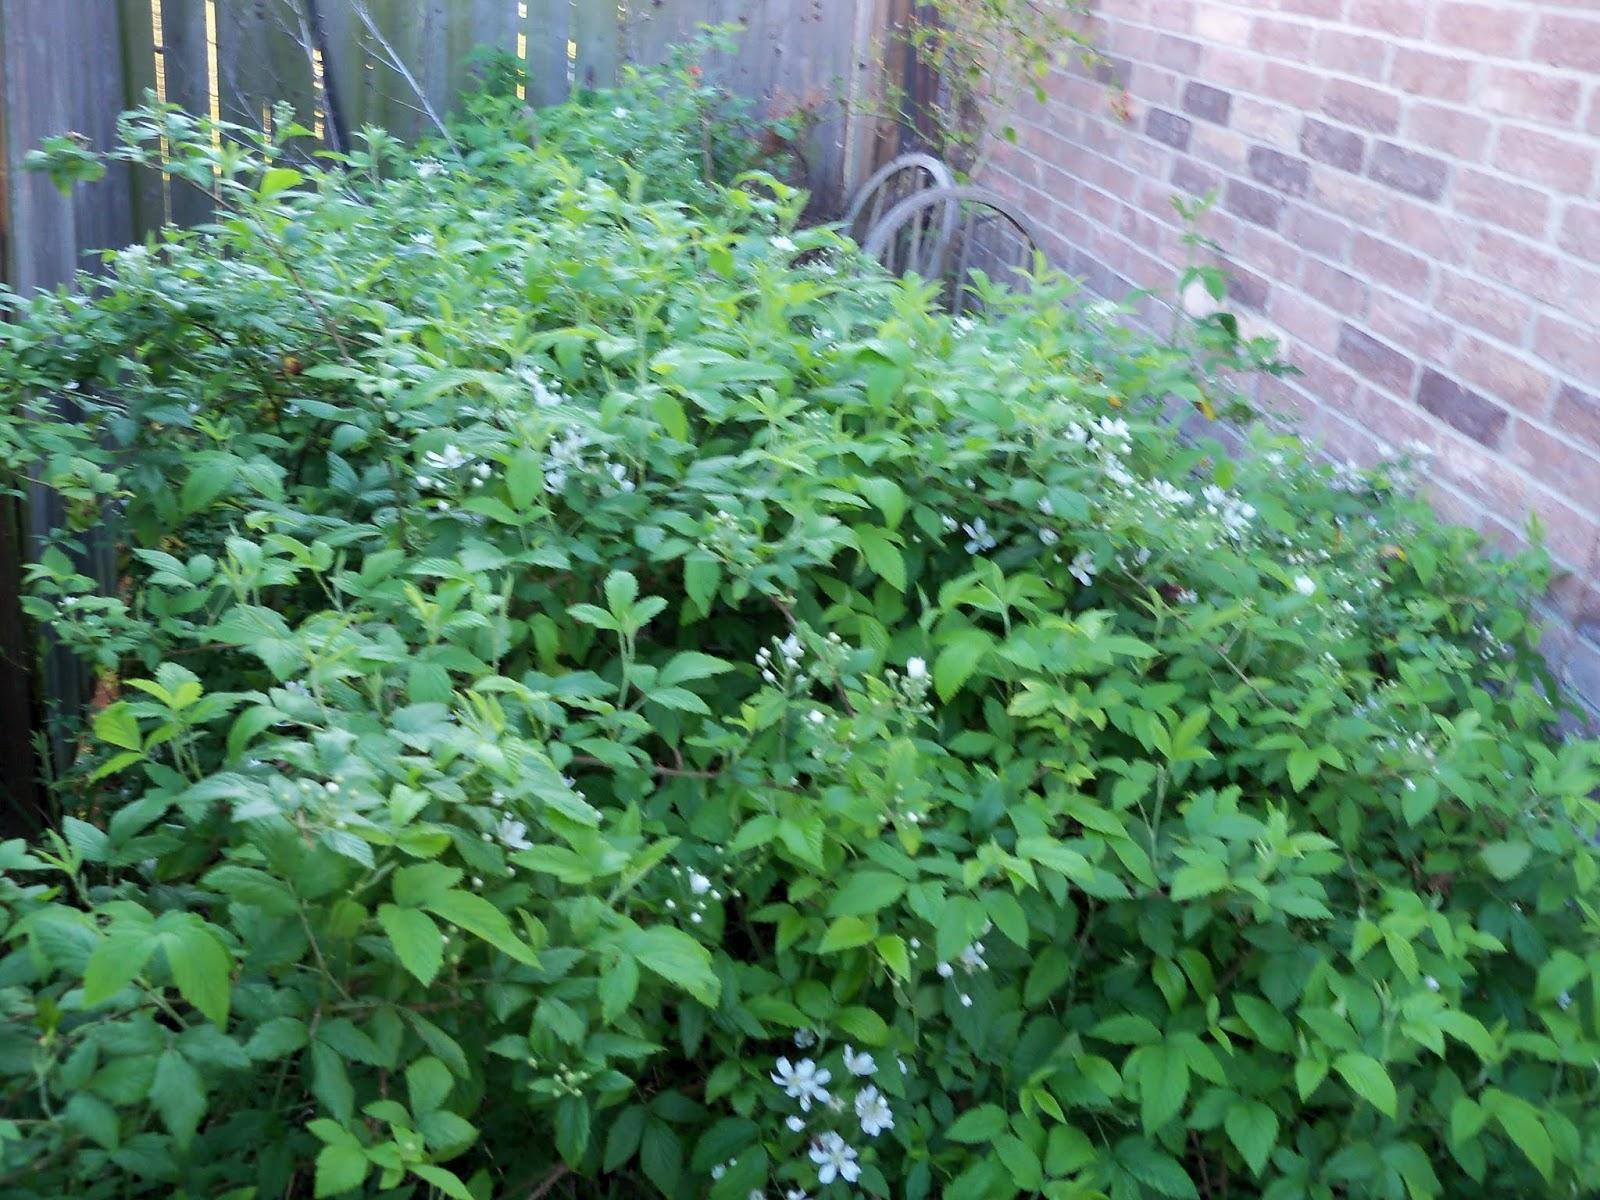 Gardening 2013 - 115_5478.JPG